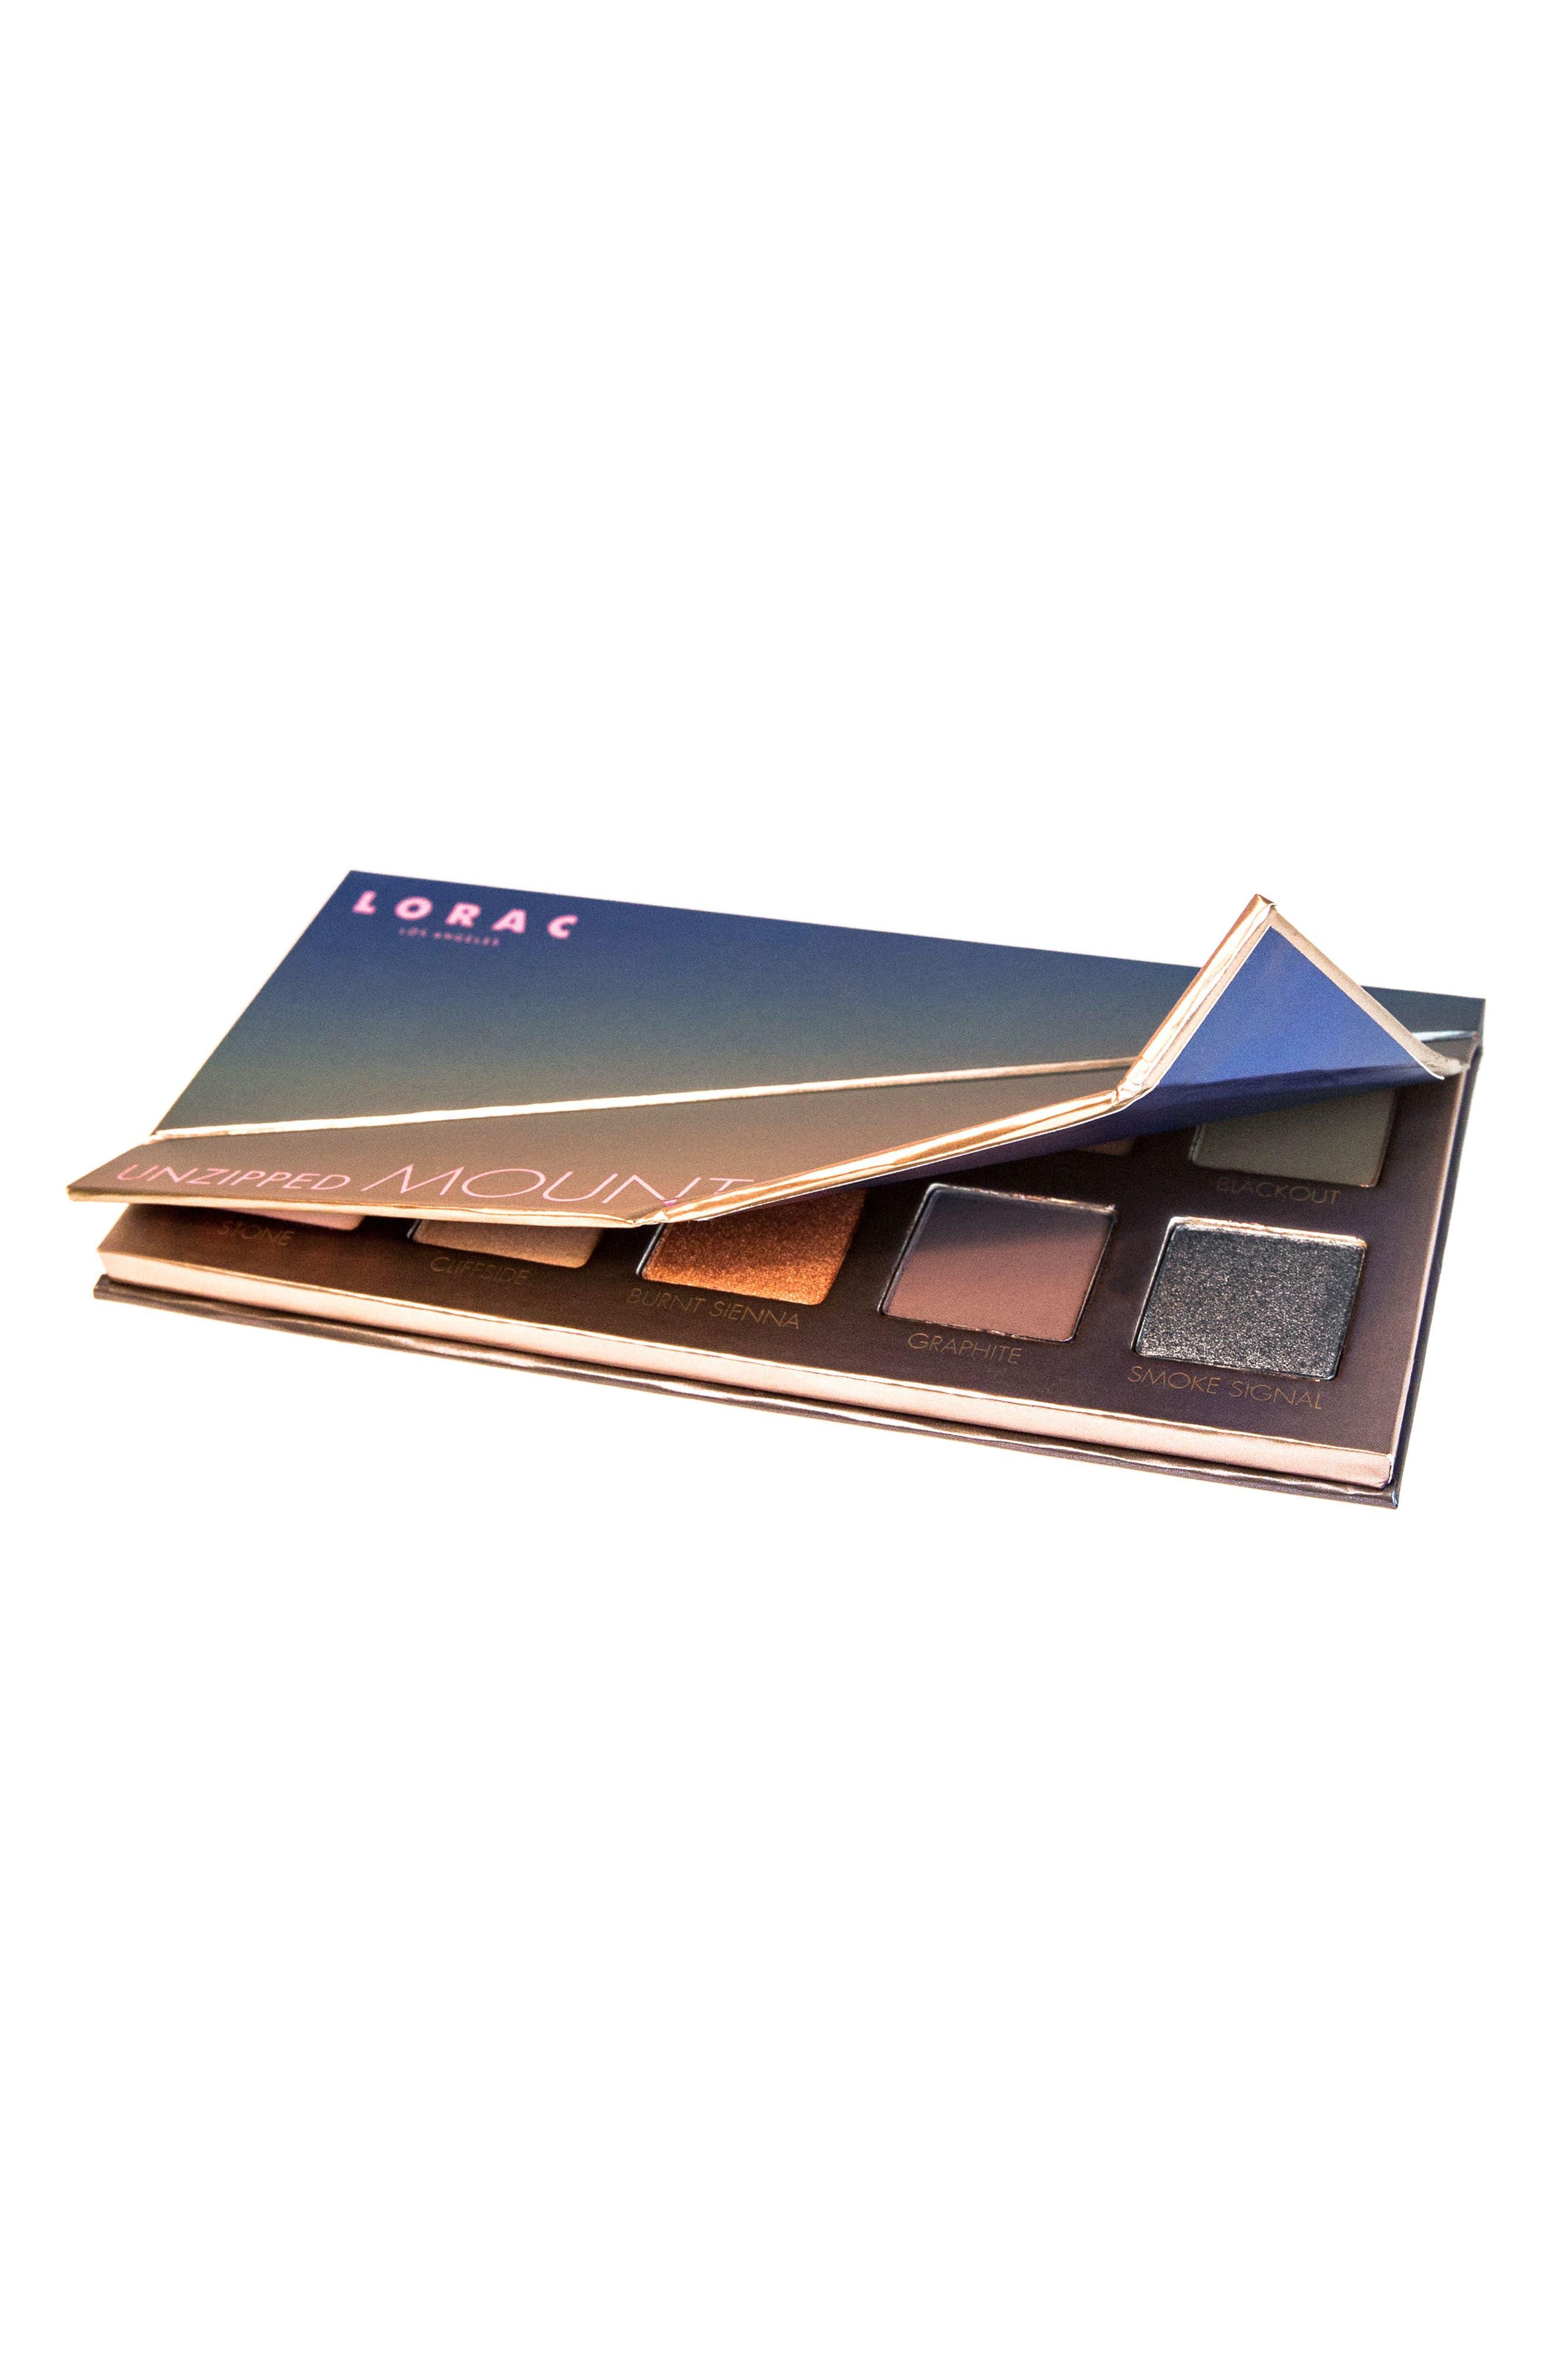 Alternate Image 2  - LORAC Unzipped Mountain Sunset Eyeshadow Palette (Limited Edition)